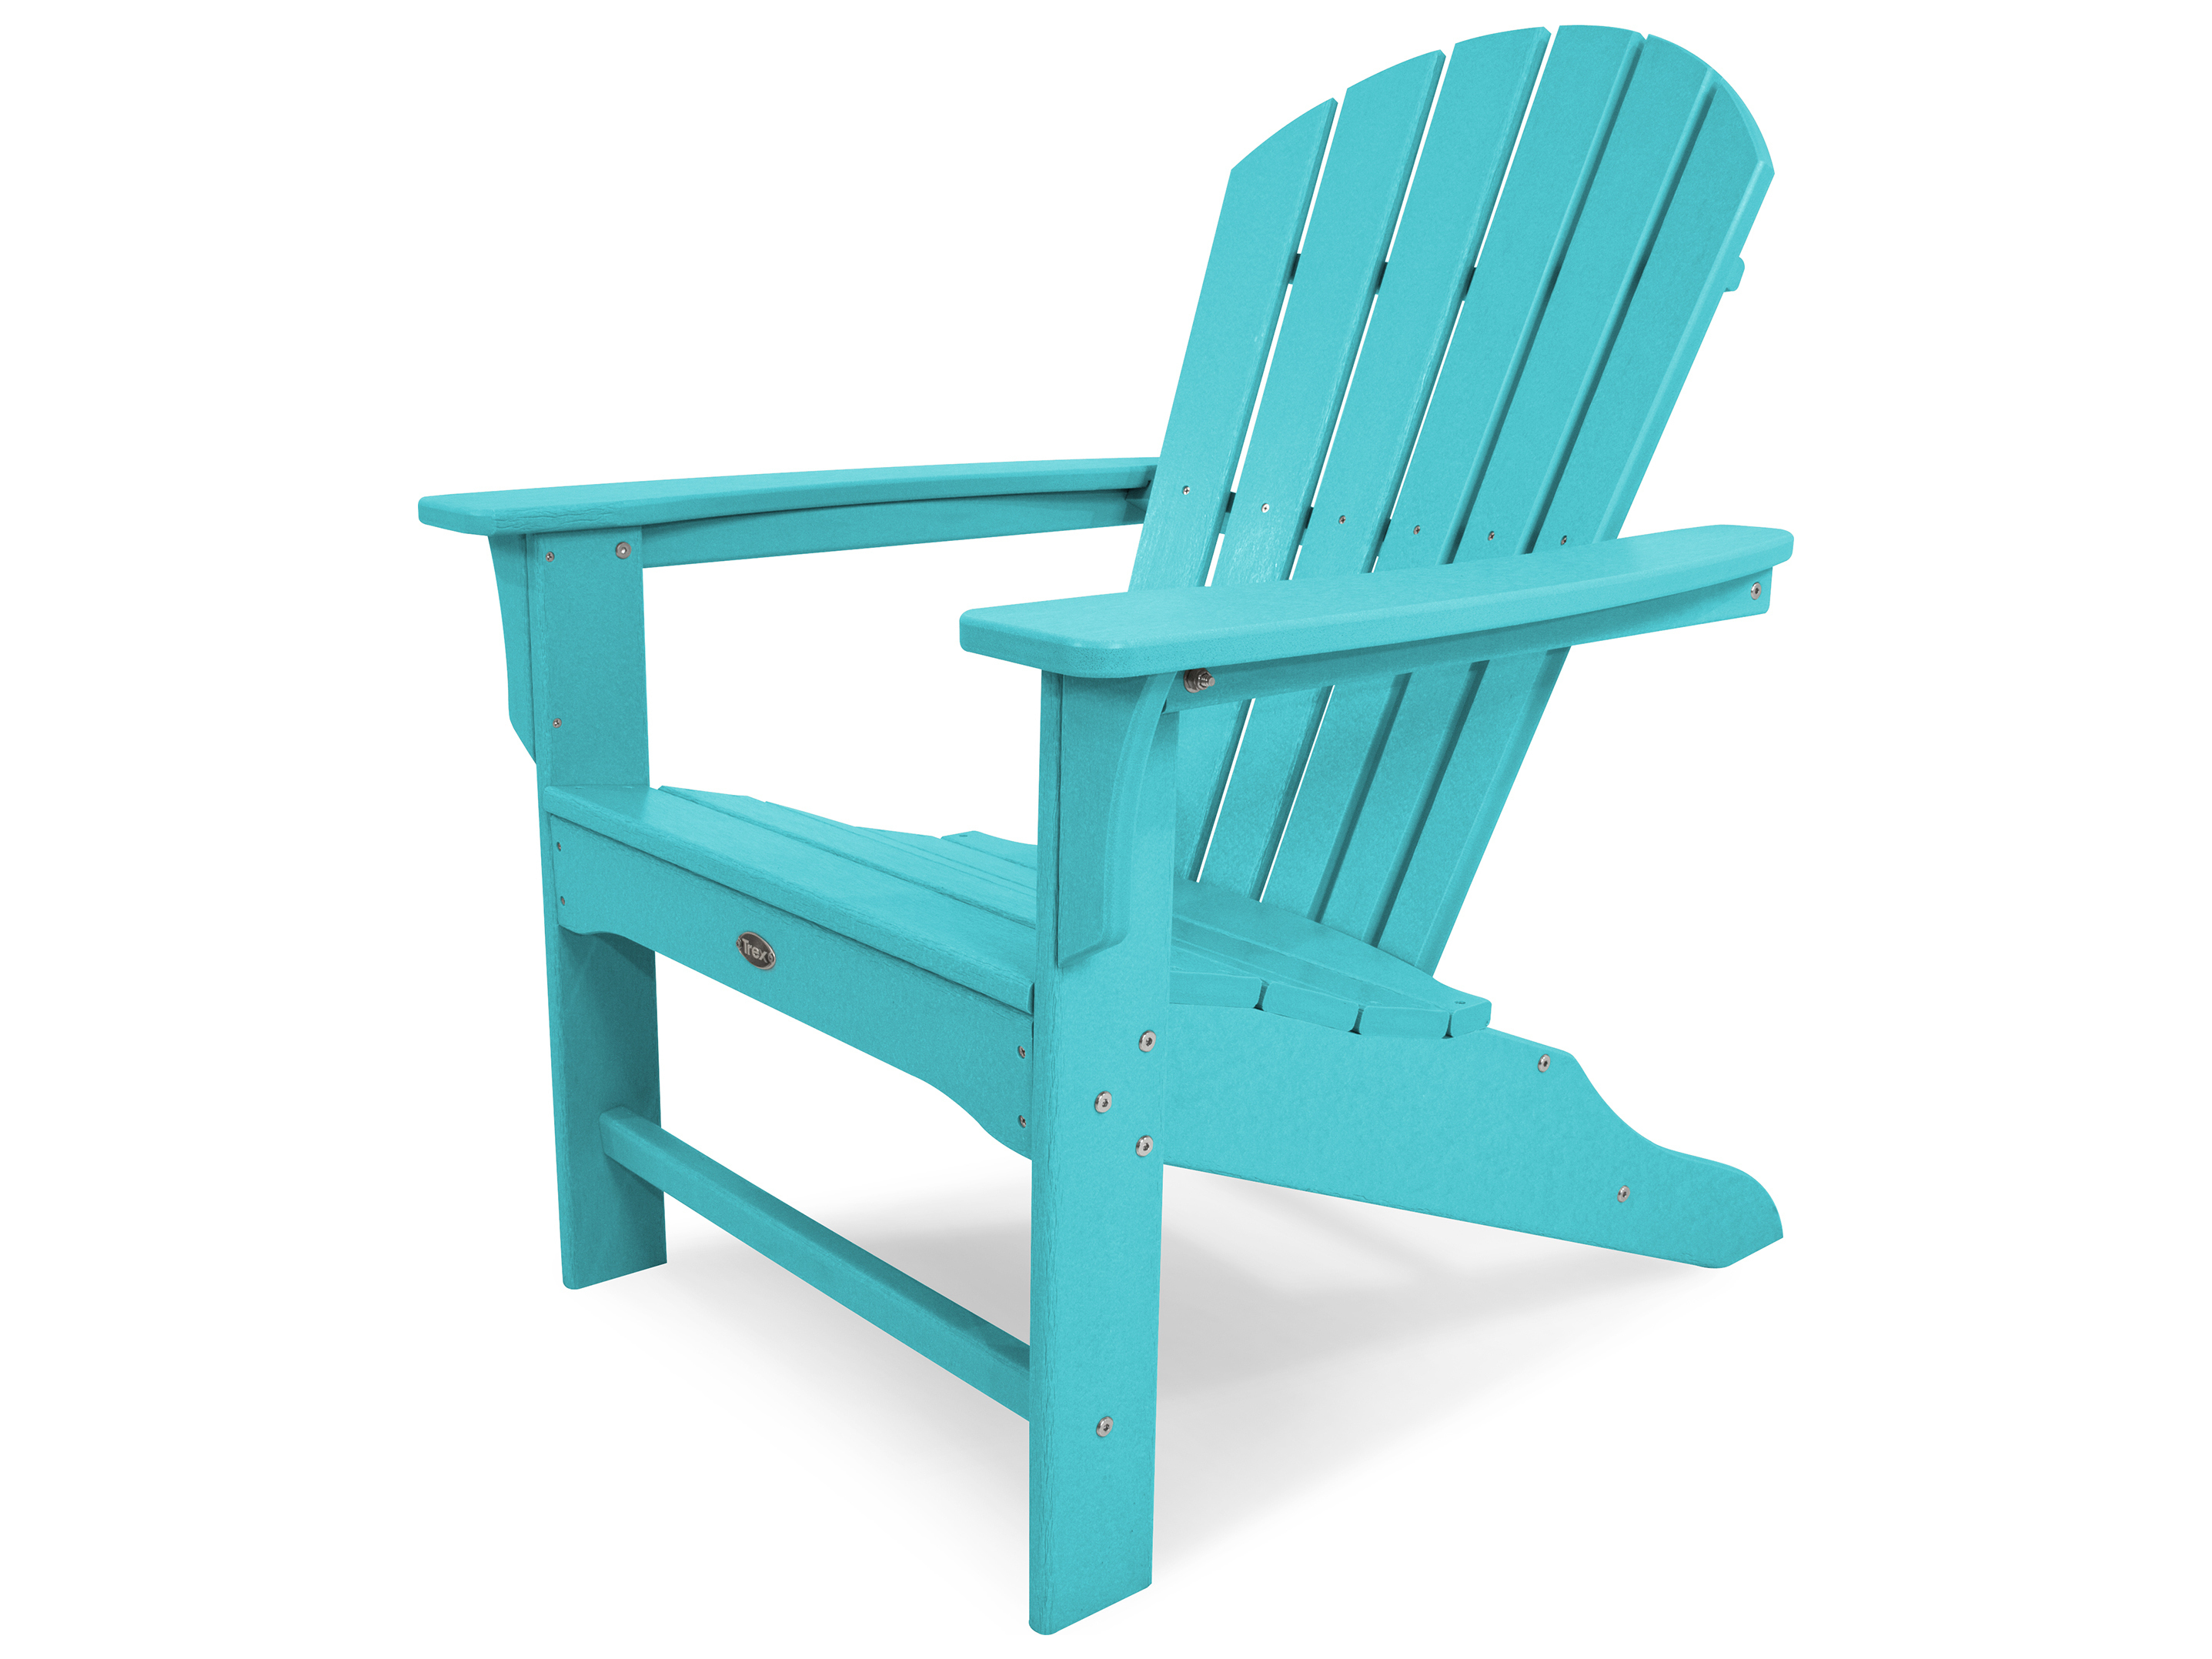 diy adirondack chair trex office yakima wa cape cod recycled plastic trxtxa15